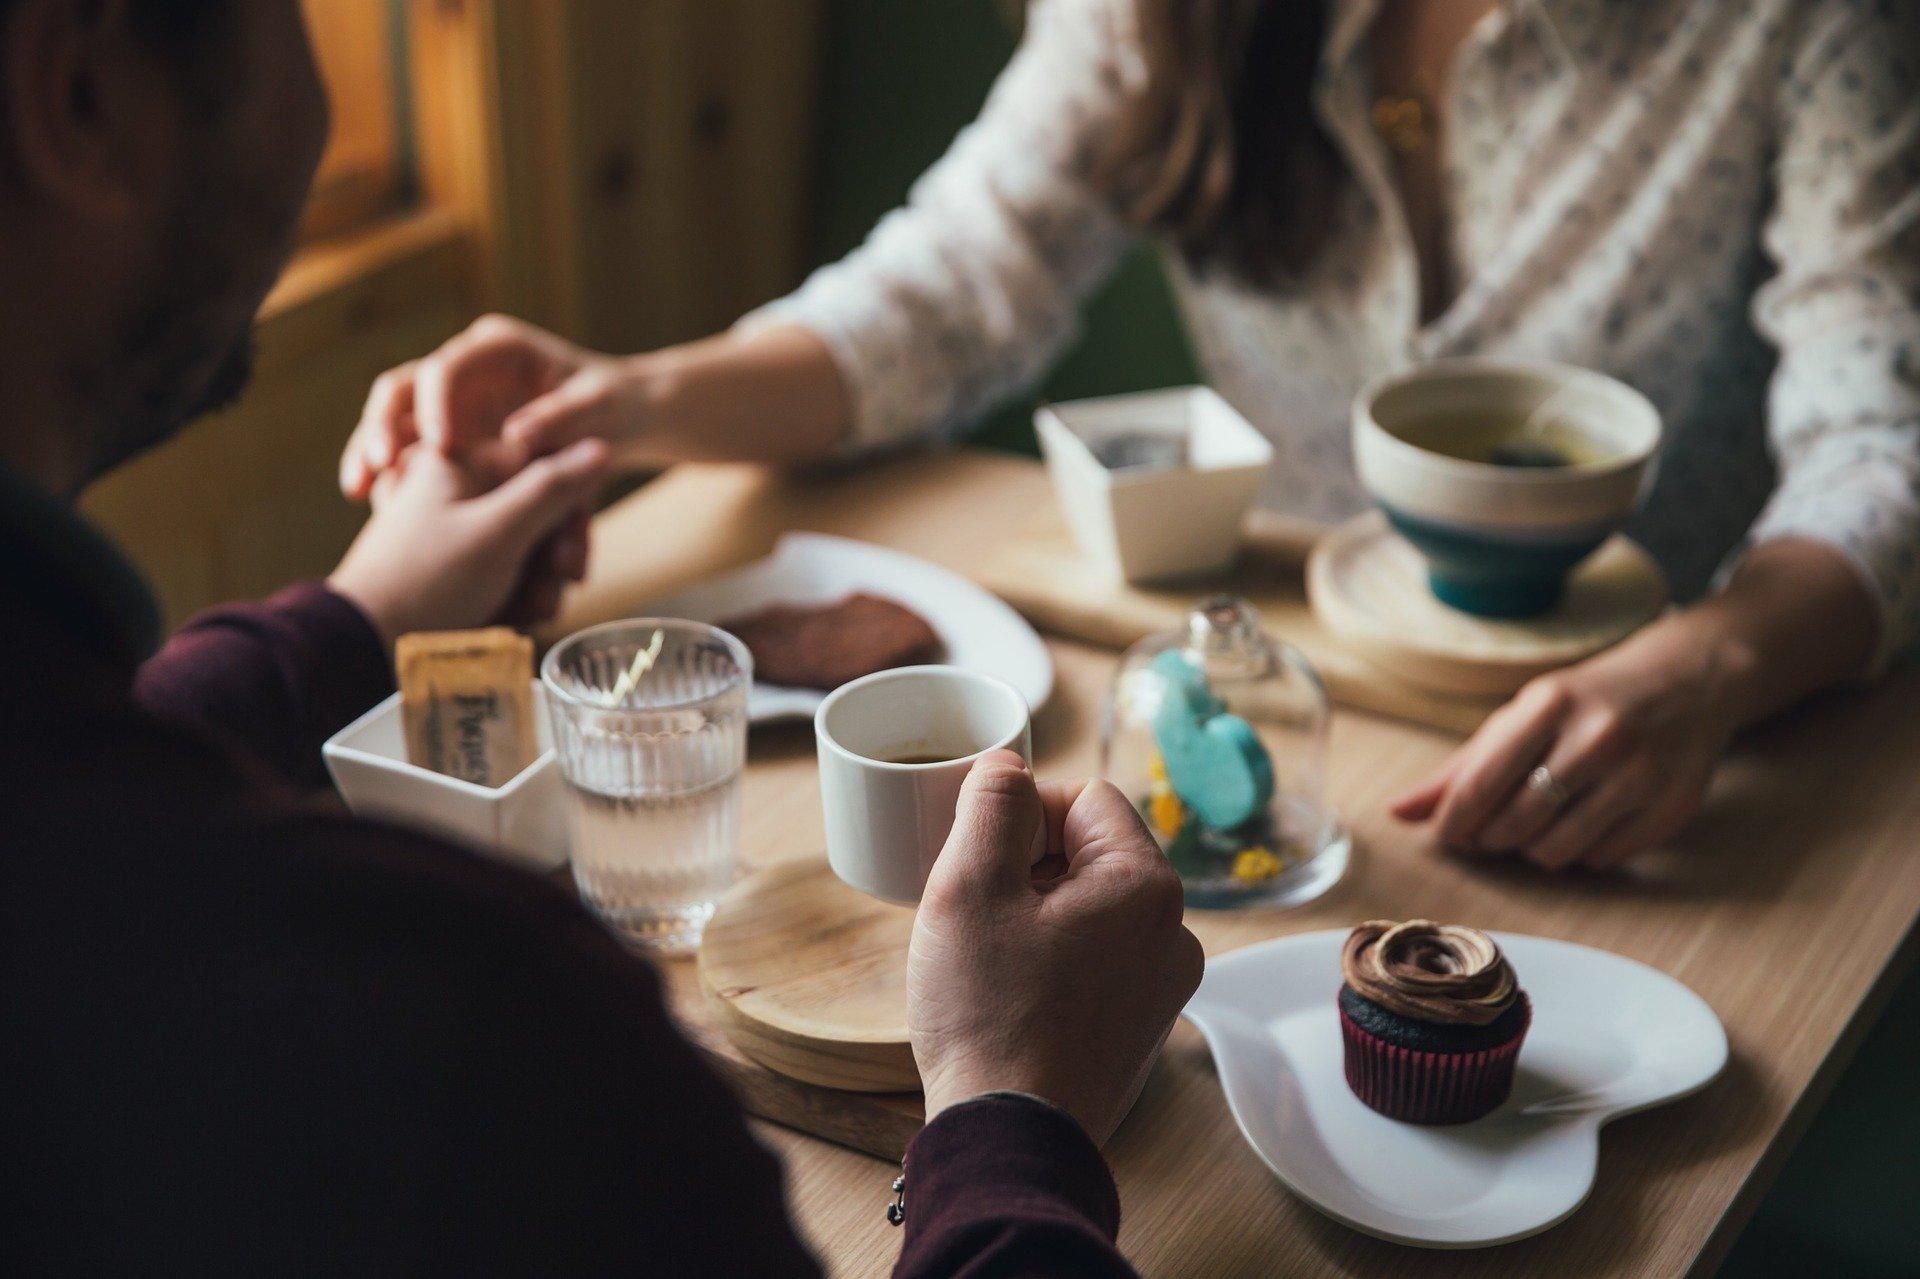 cafetería holding hands cita date